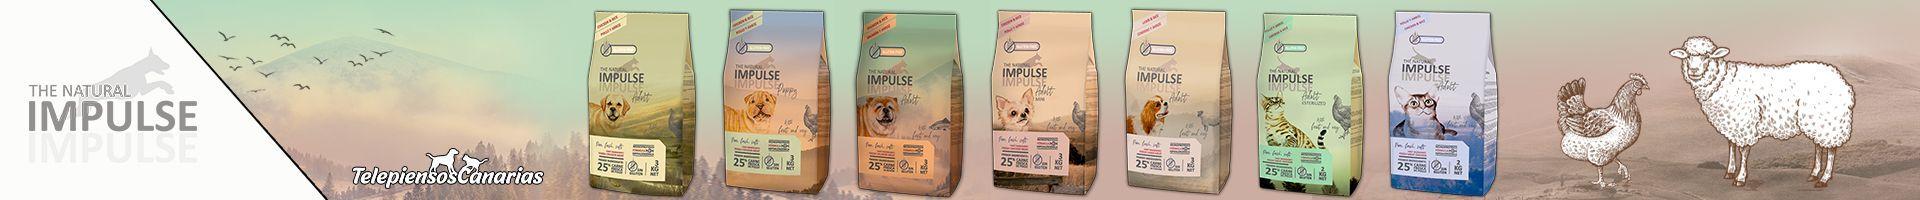 natural impulse perro gato telepiensoscanarias